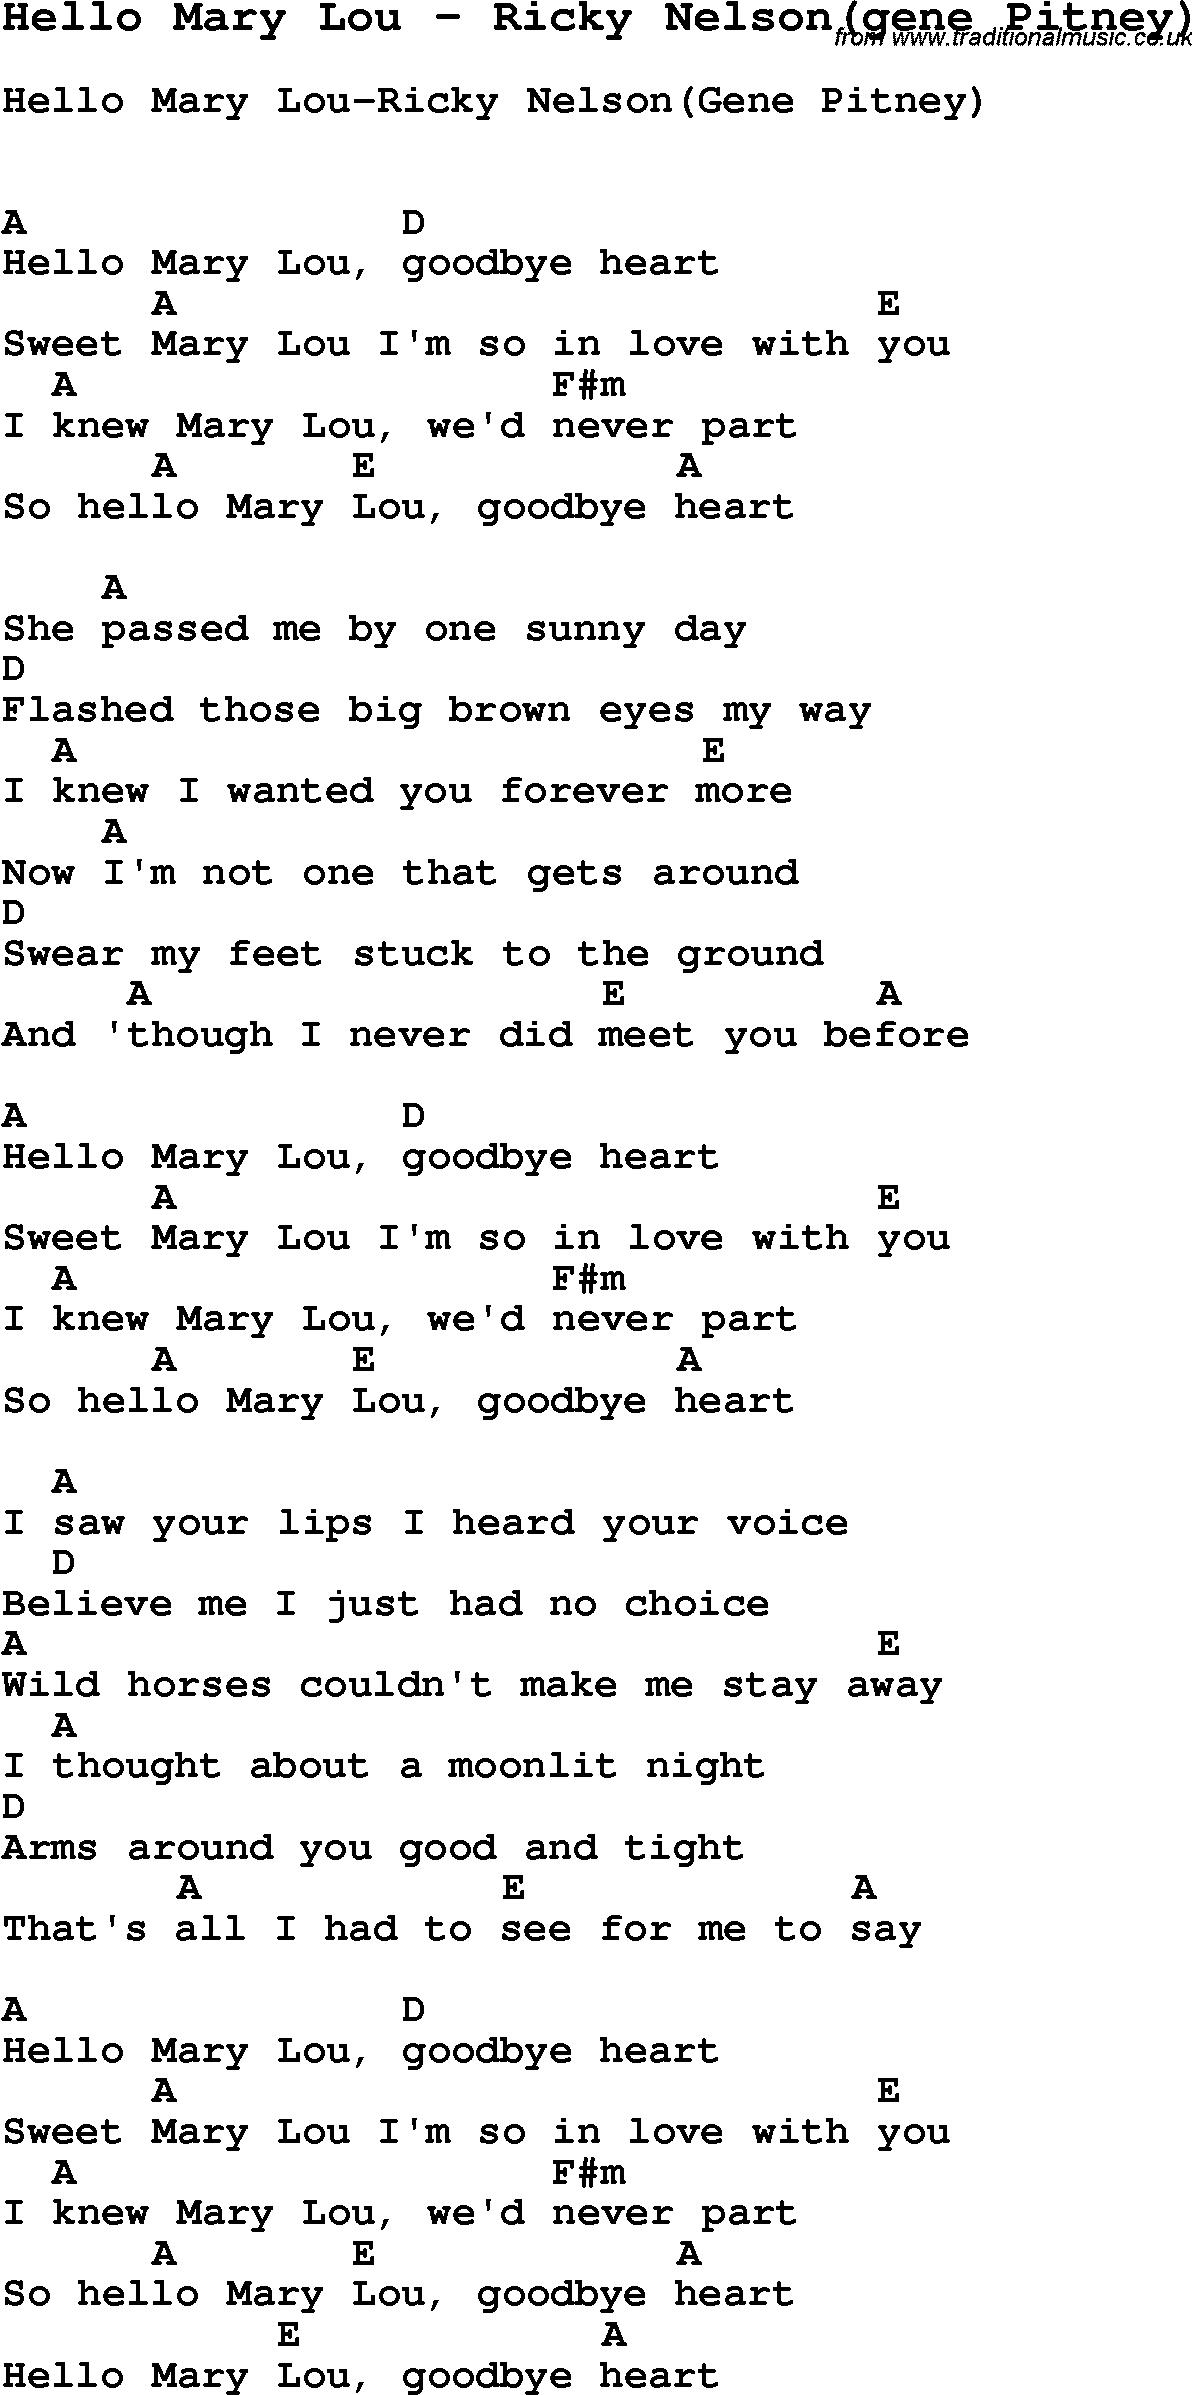 Song hello mary lou by ricky nelsongene pitney with lyrics for song hello mary lou by ricky nelsongene pitney song lyric for vocal performance plus accompaniment chords for ukulele guitar banjo etc hexwebz Choice Image